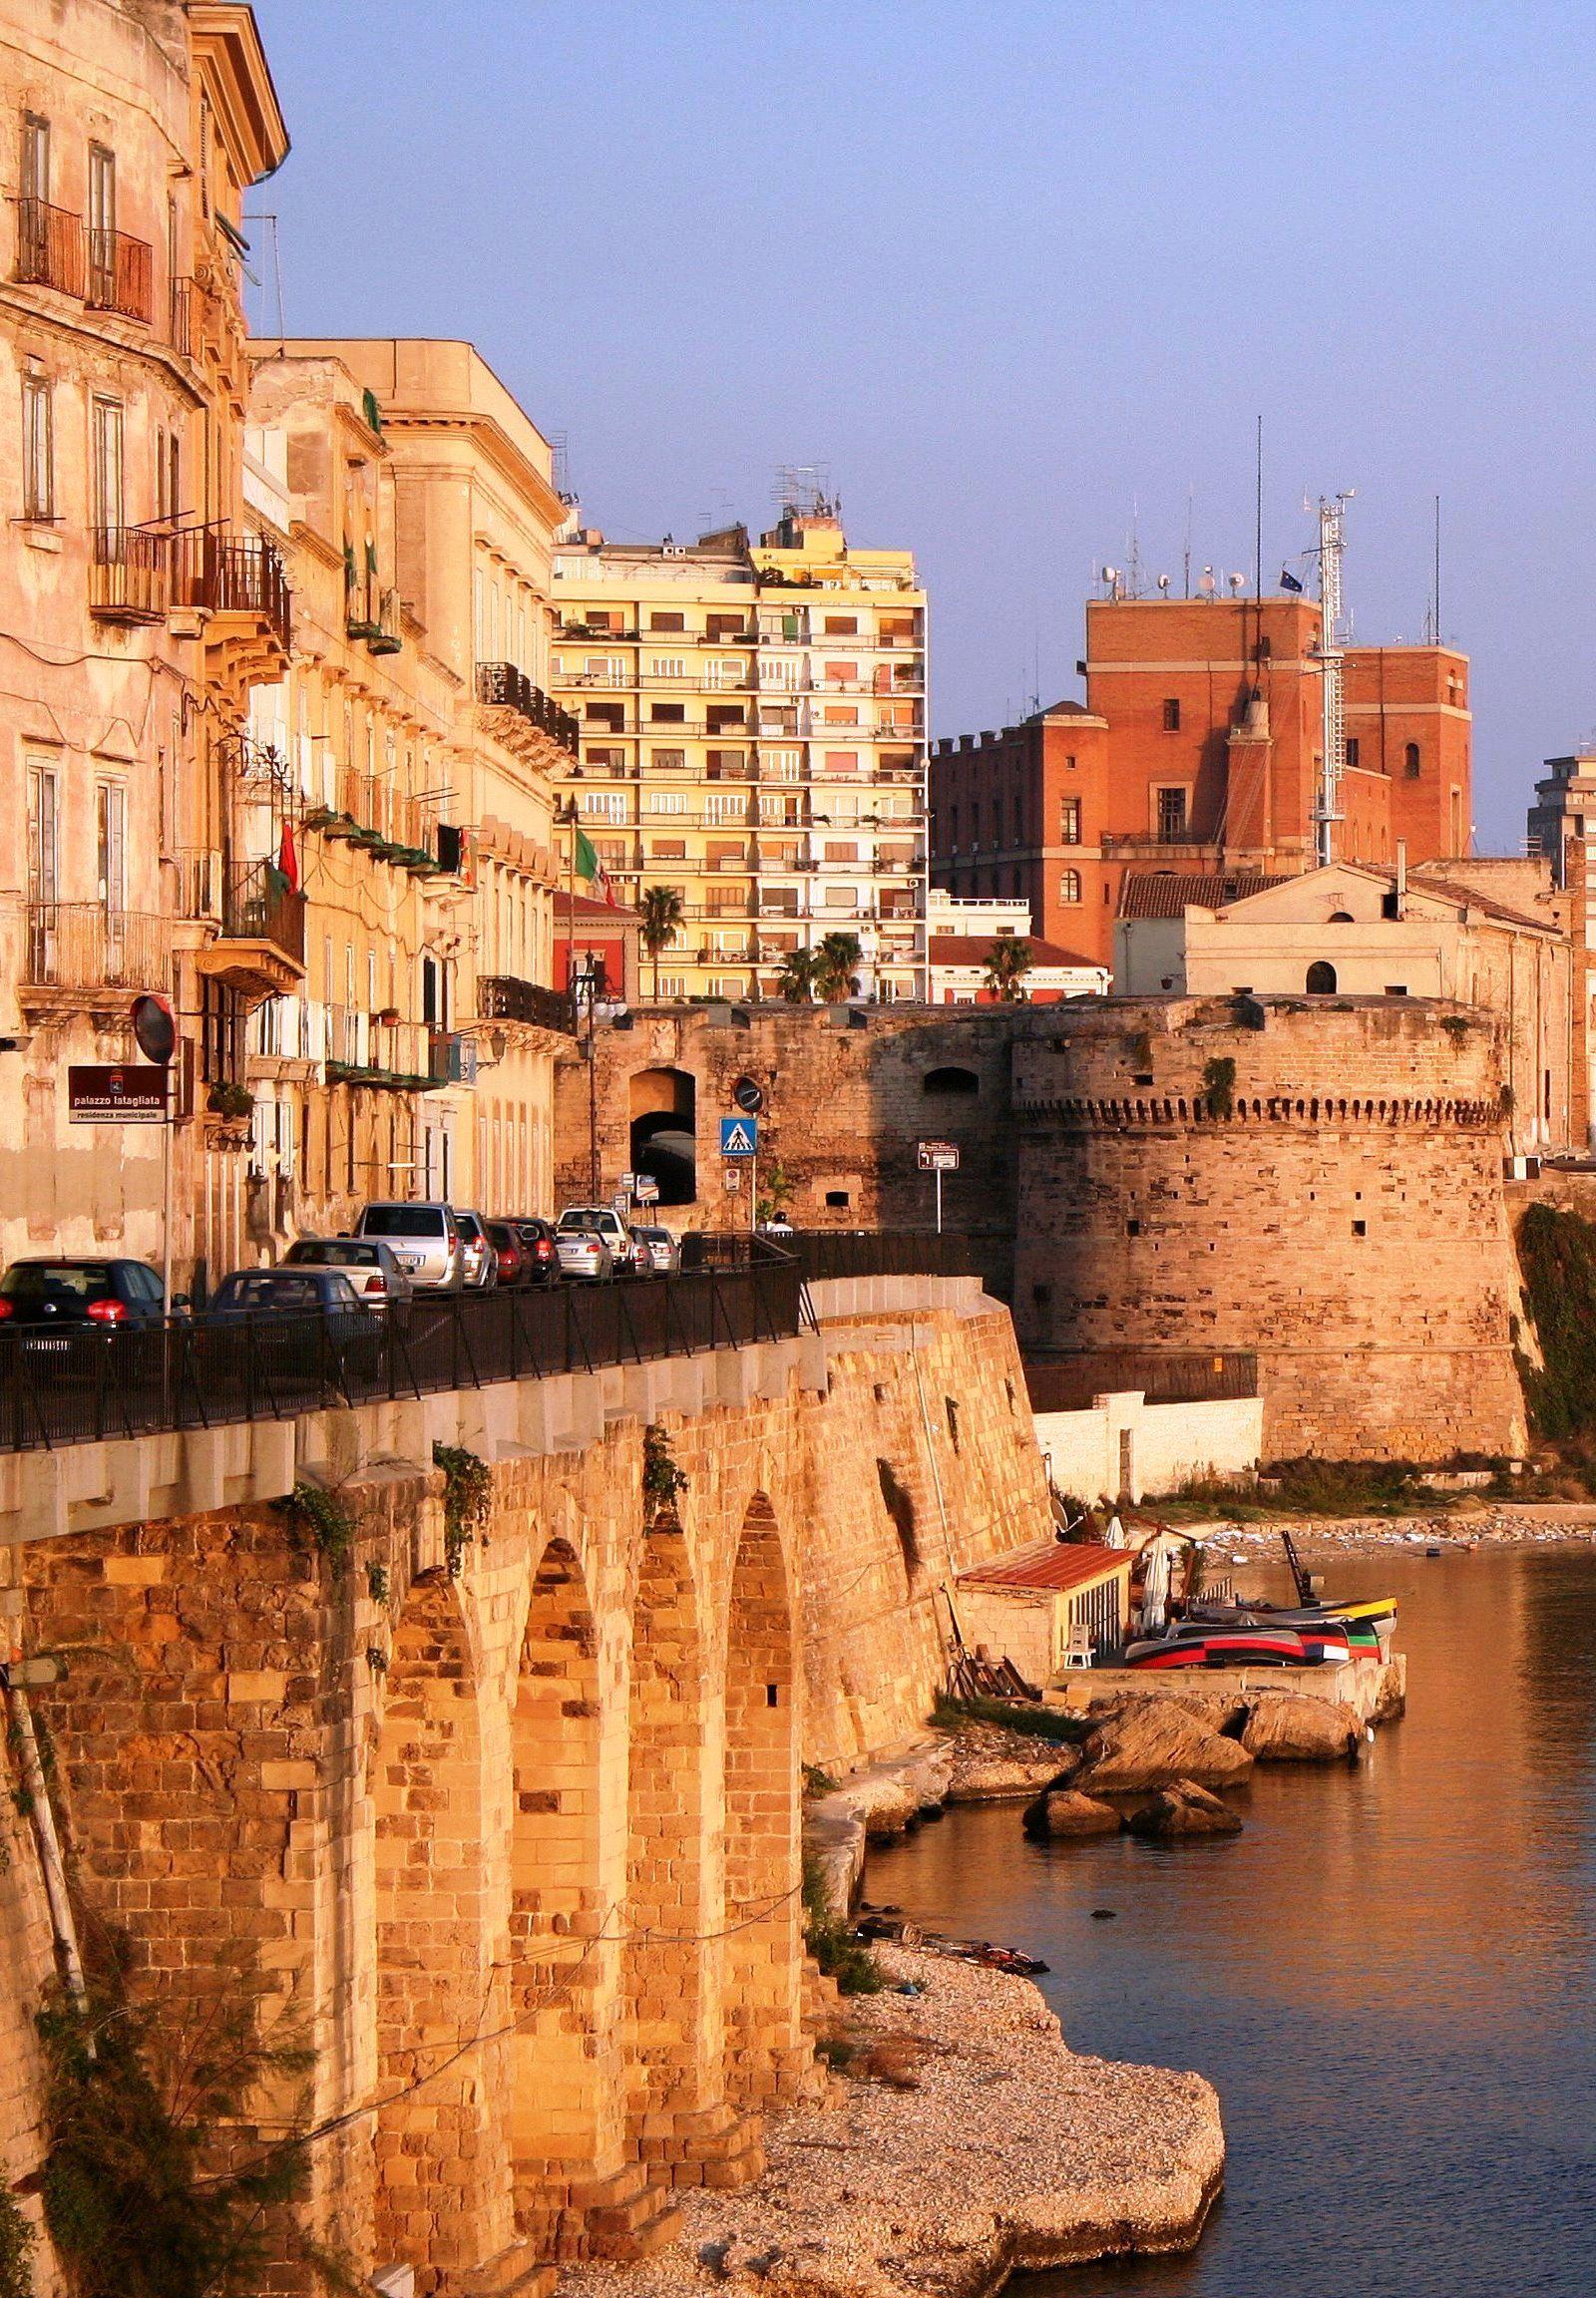 50 Most Beautiful Cities in Italy | Città vecchia, Città